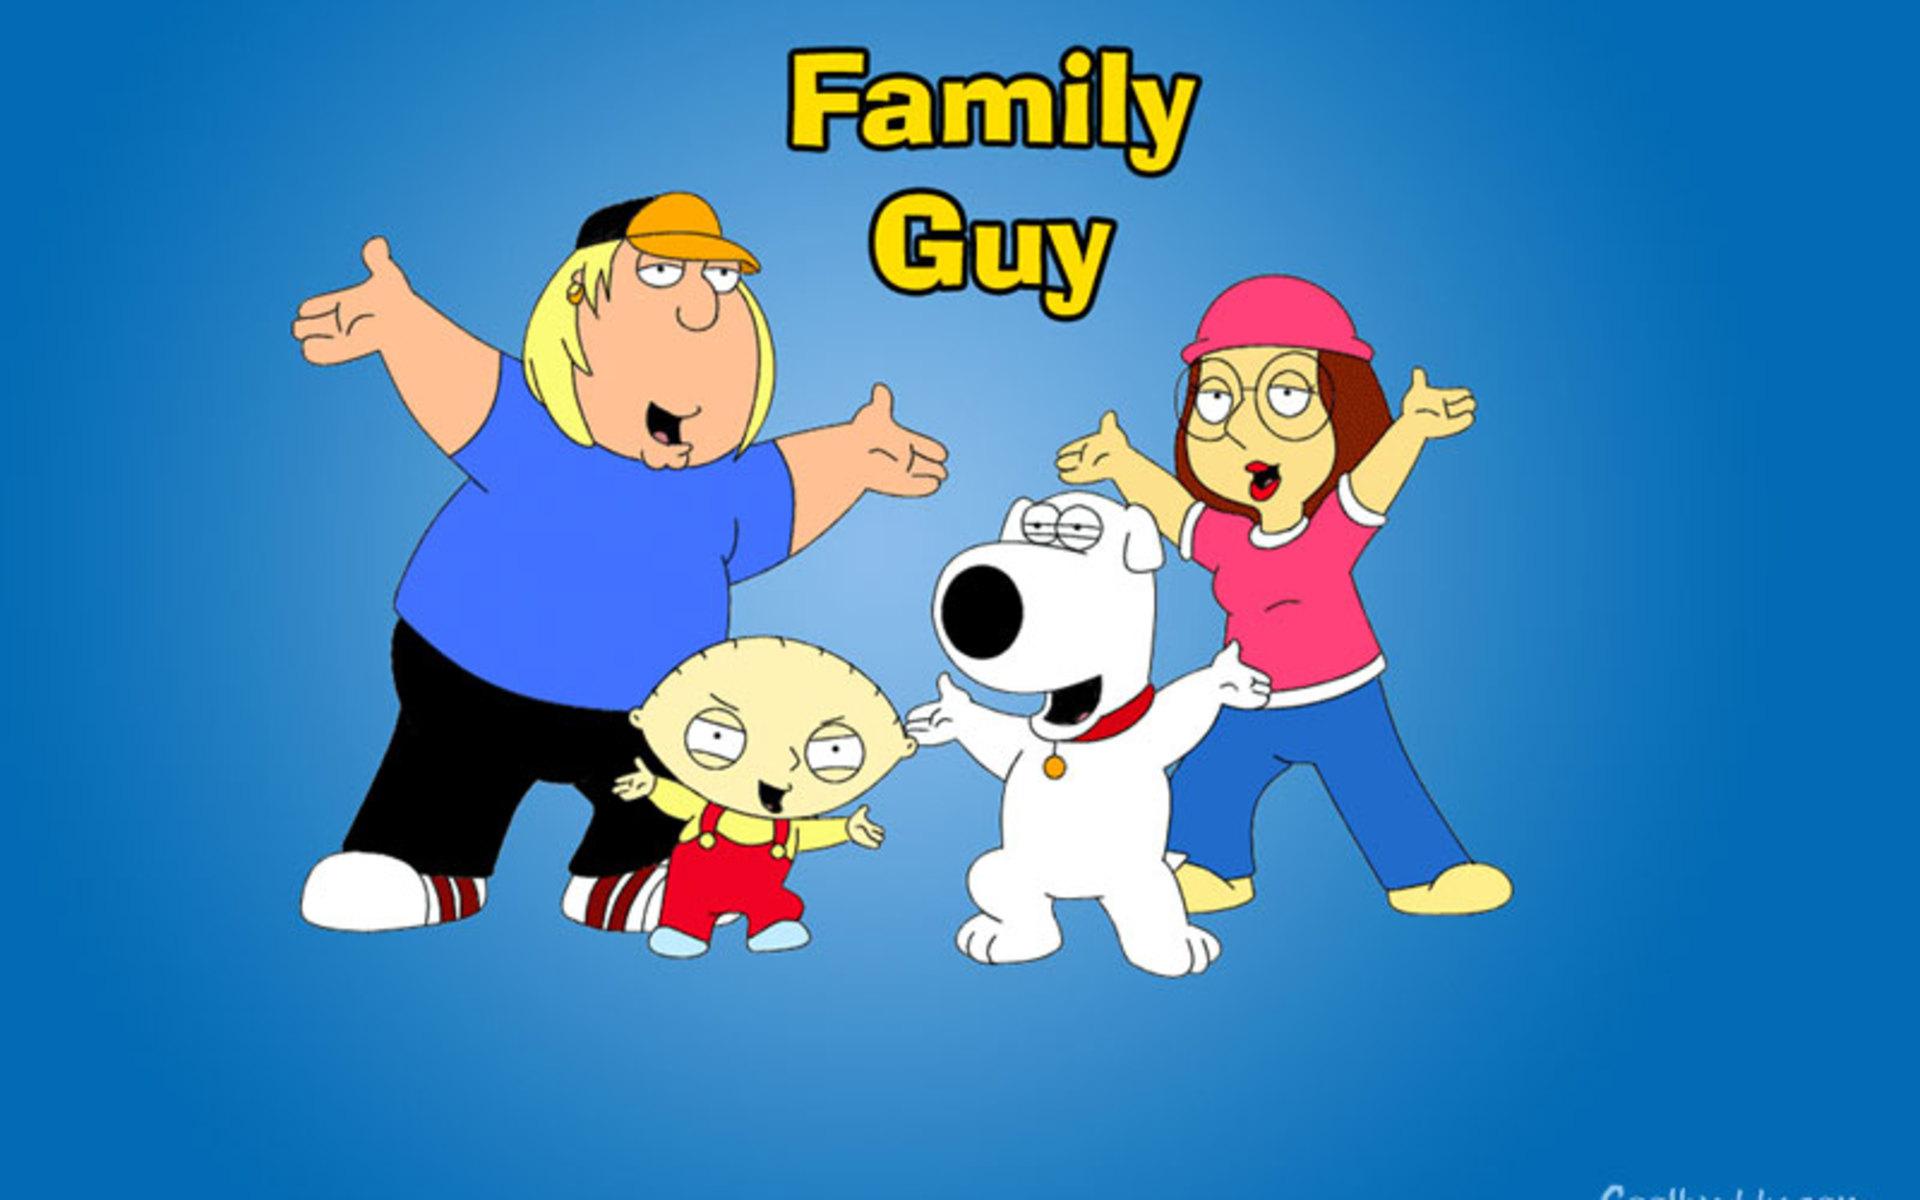 family guy wallpapers mac - photo #26